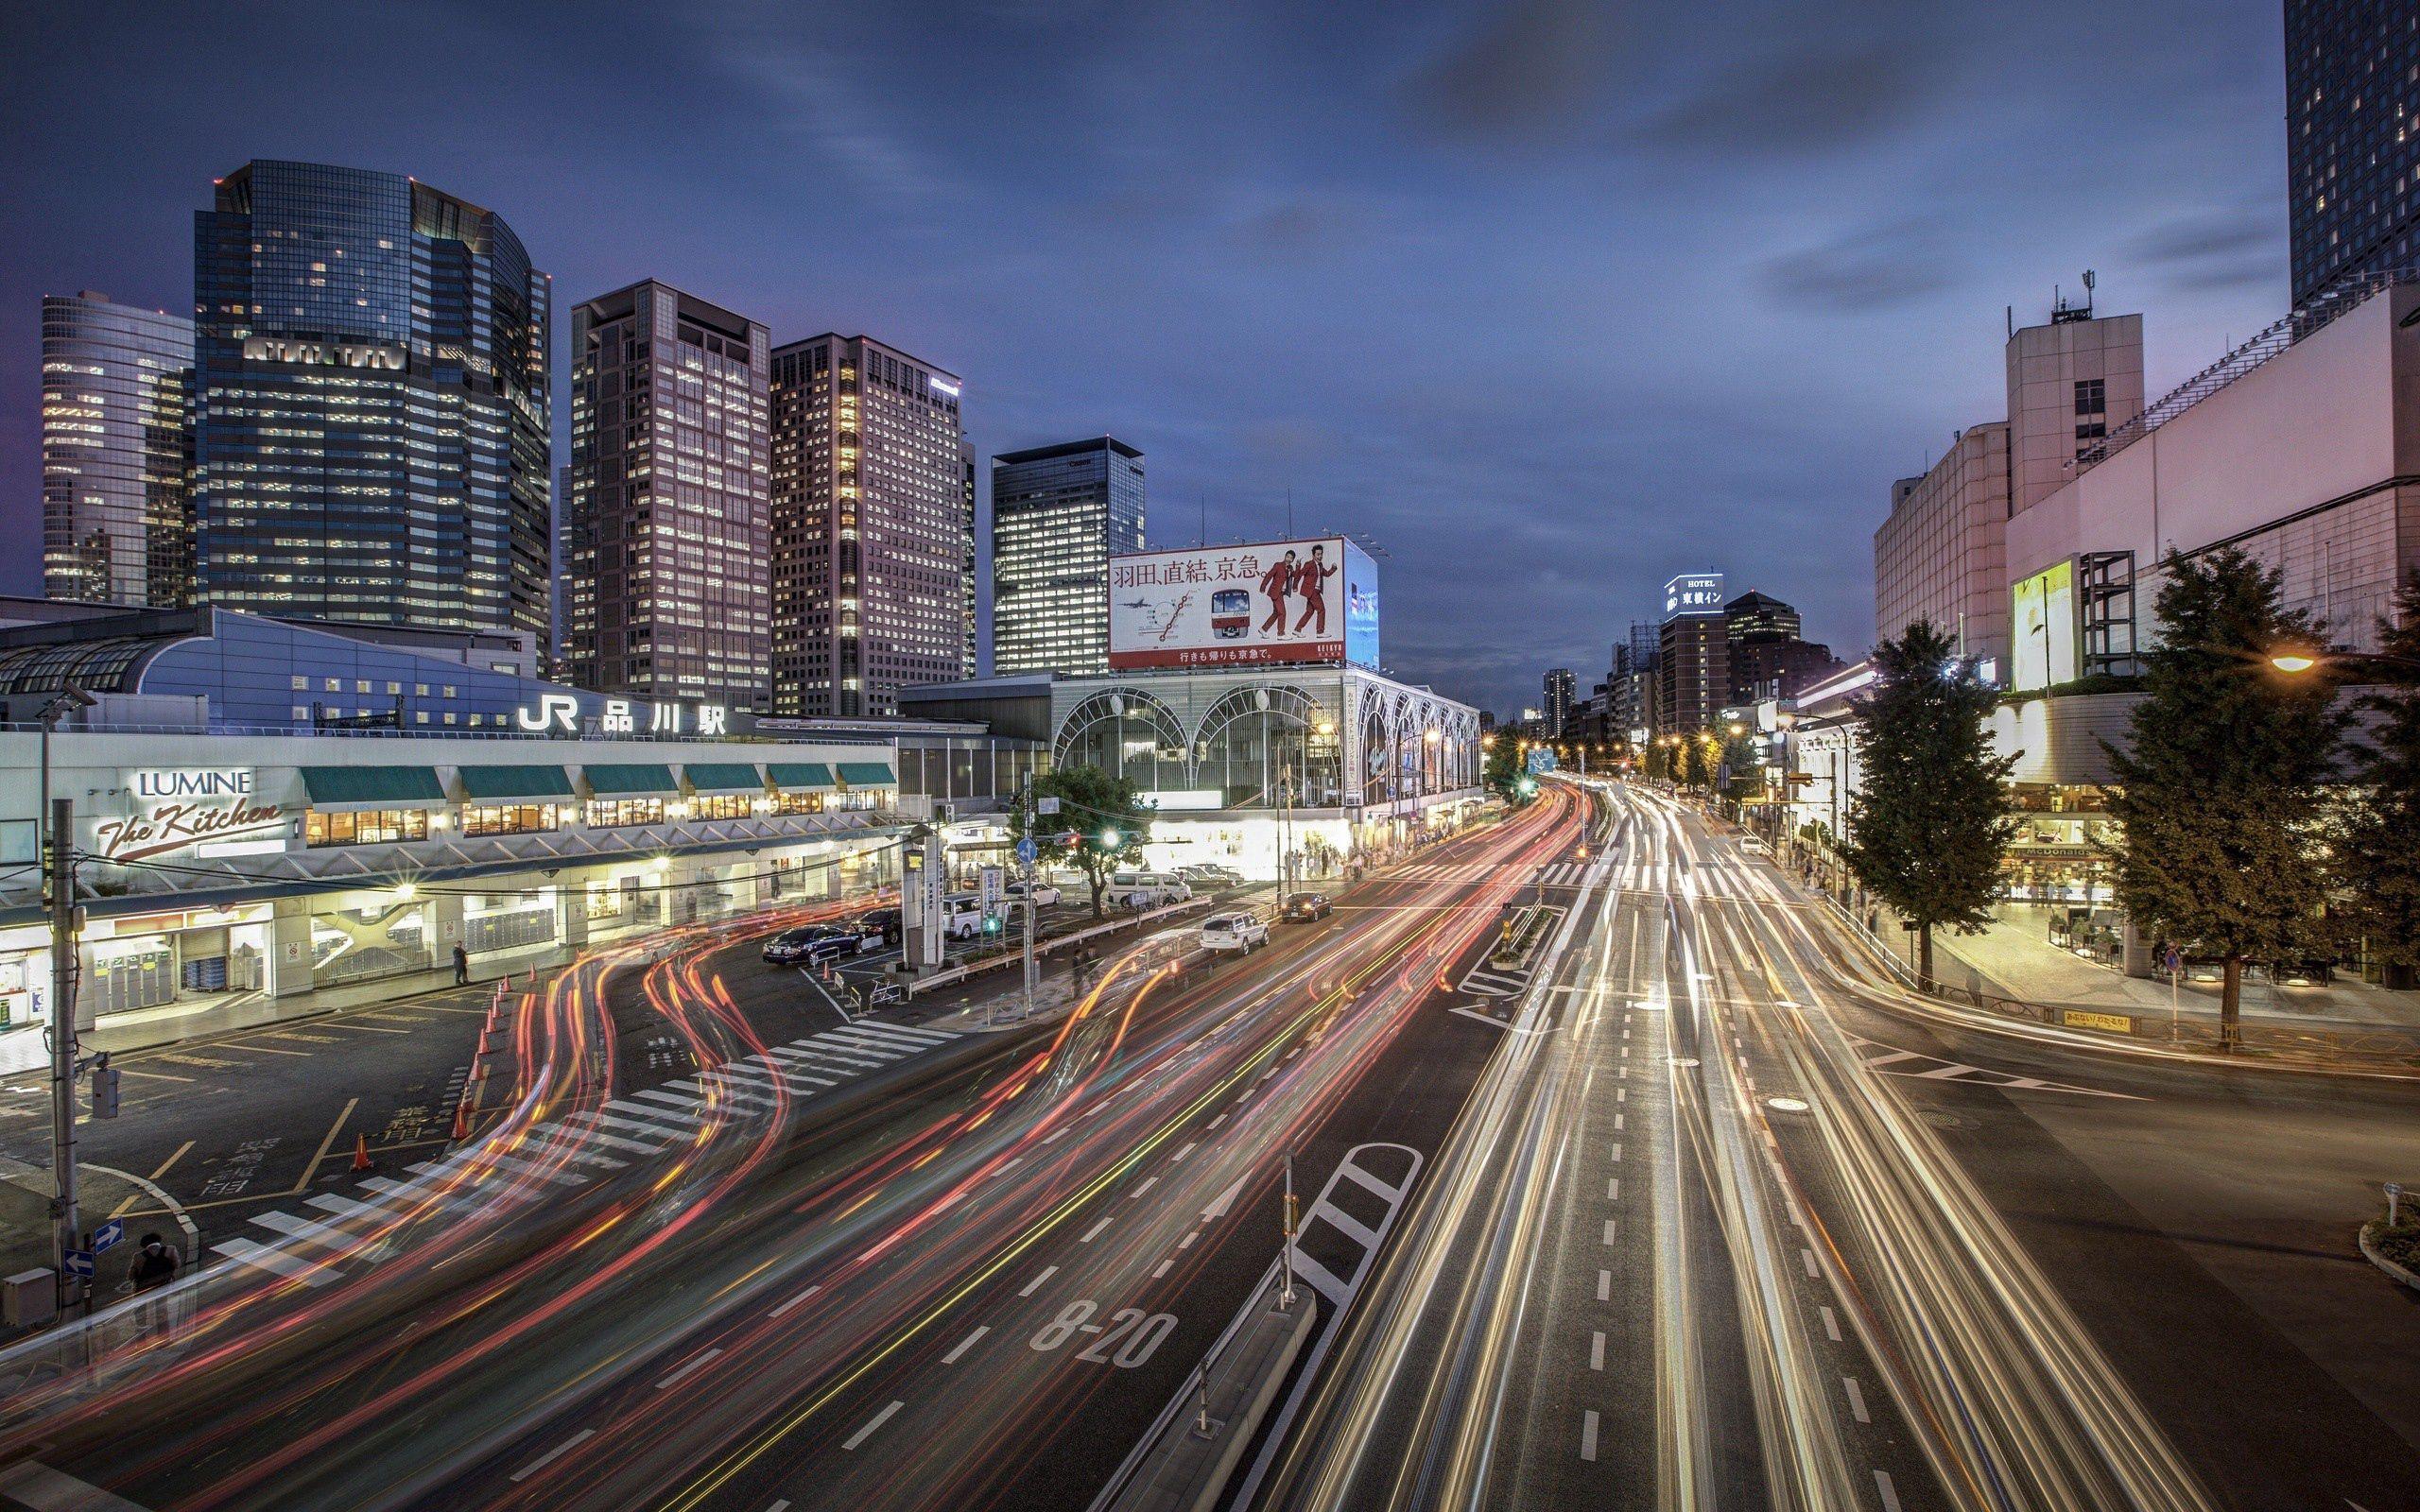 63609 download wallpaper Cities, Japan, Tokyo, Shinagawa Station, Sinagawa Station screensavers and pictures for free